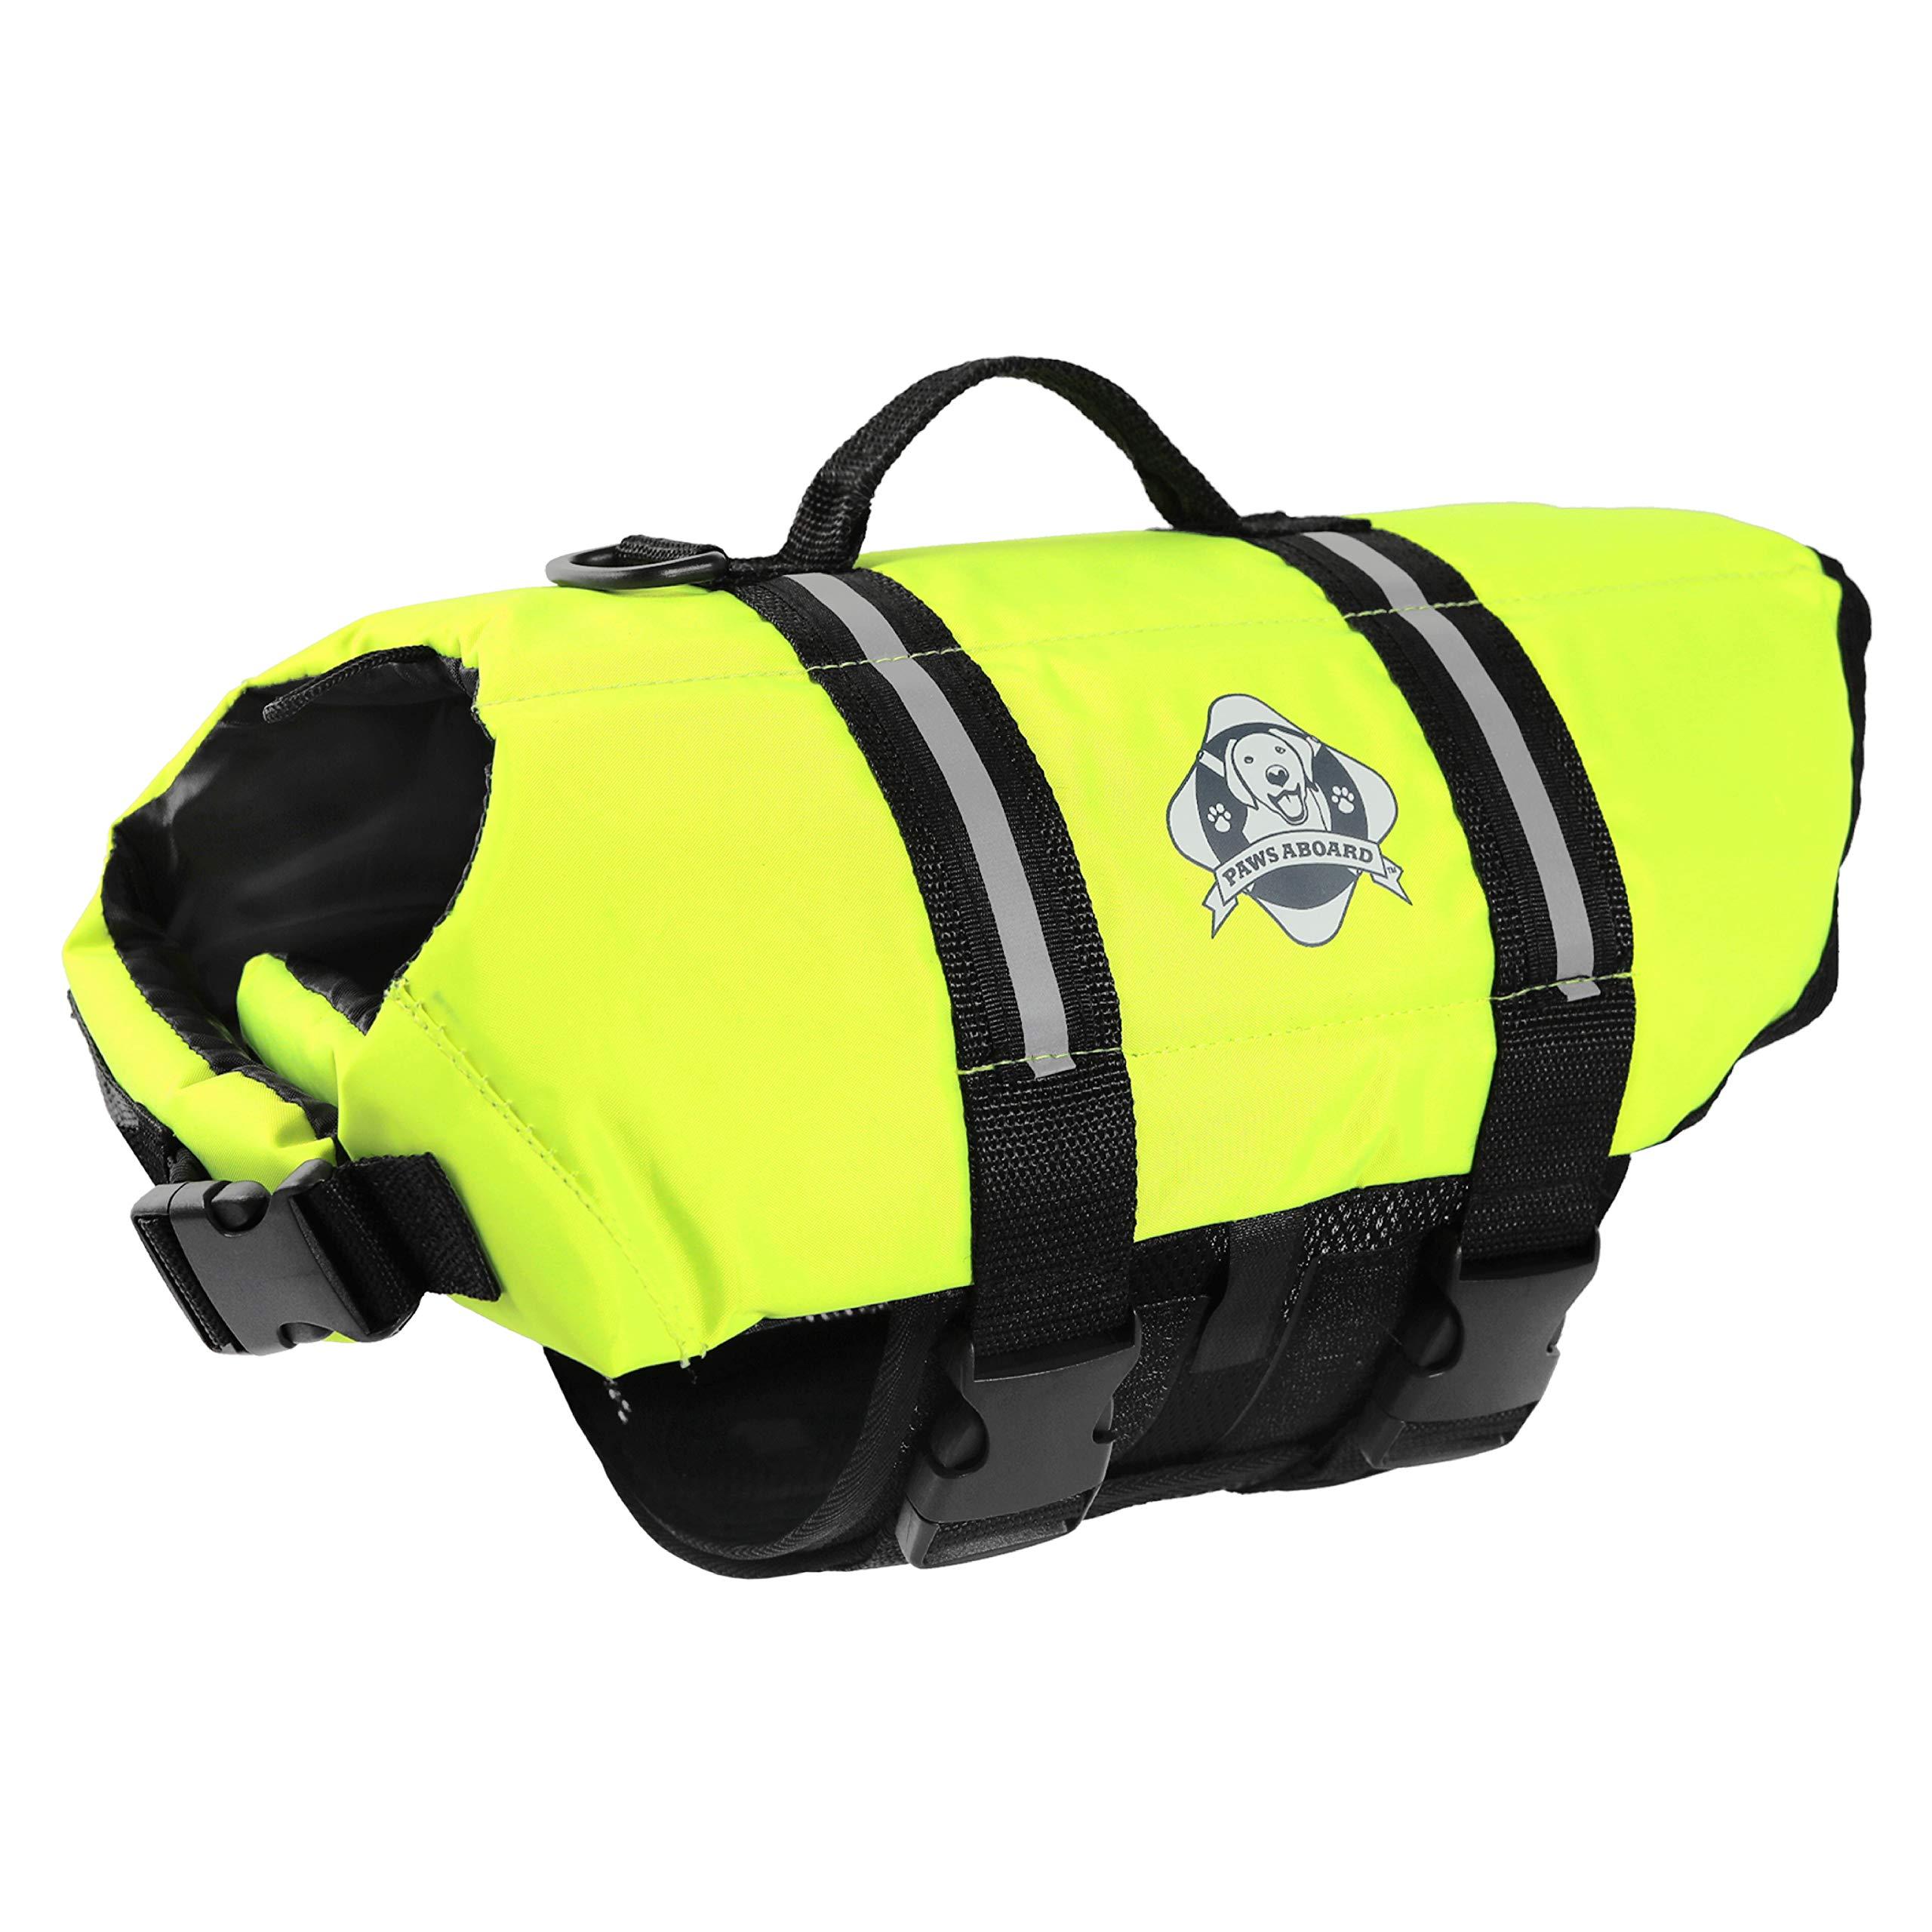 Paws Aboard Doggy Life Jacket XXS-Safety Neon Yellow